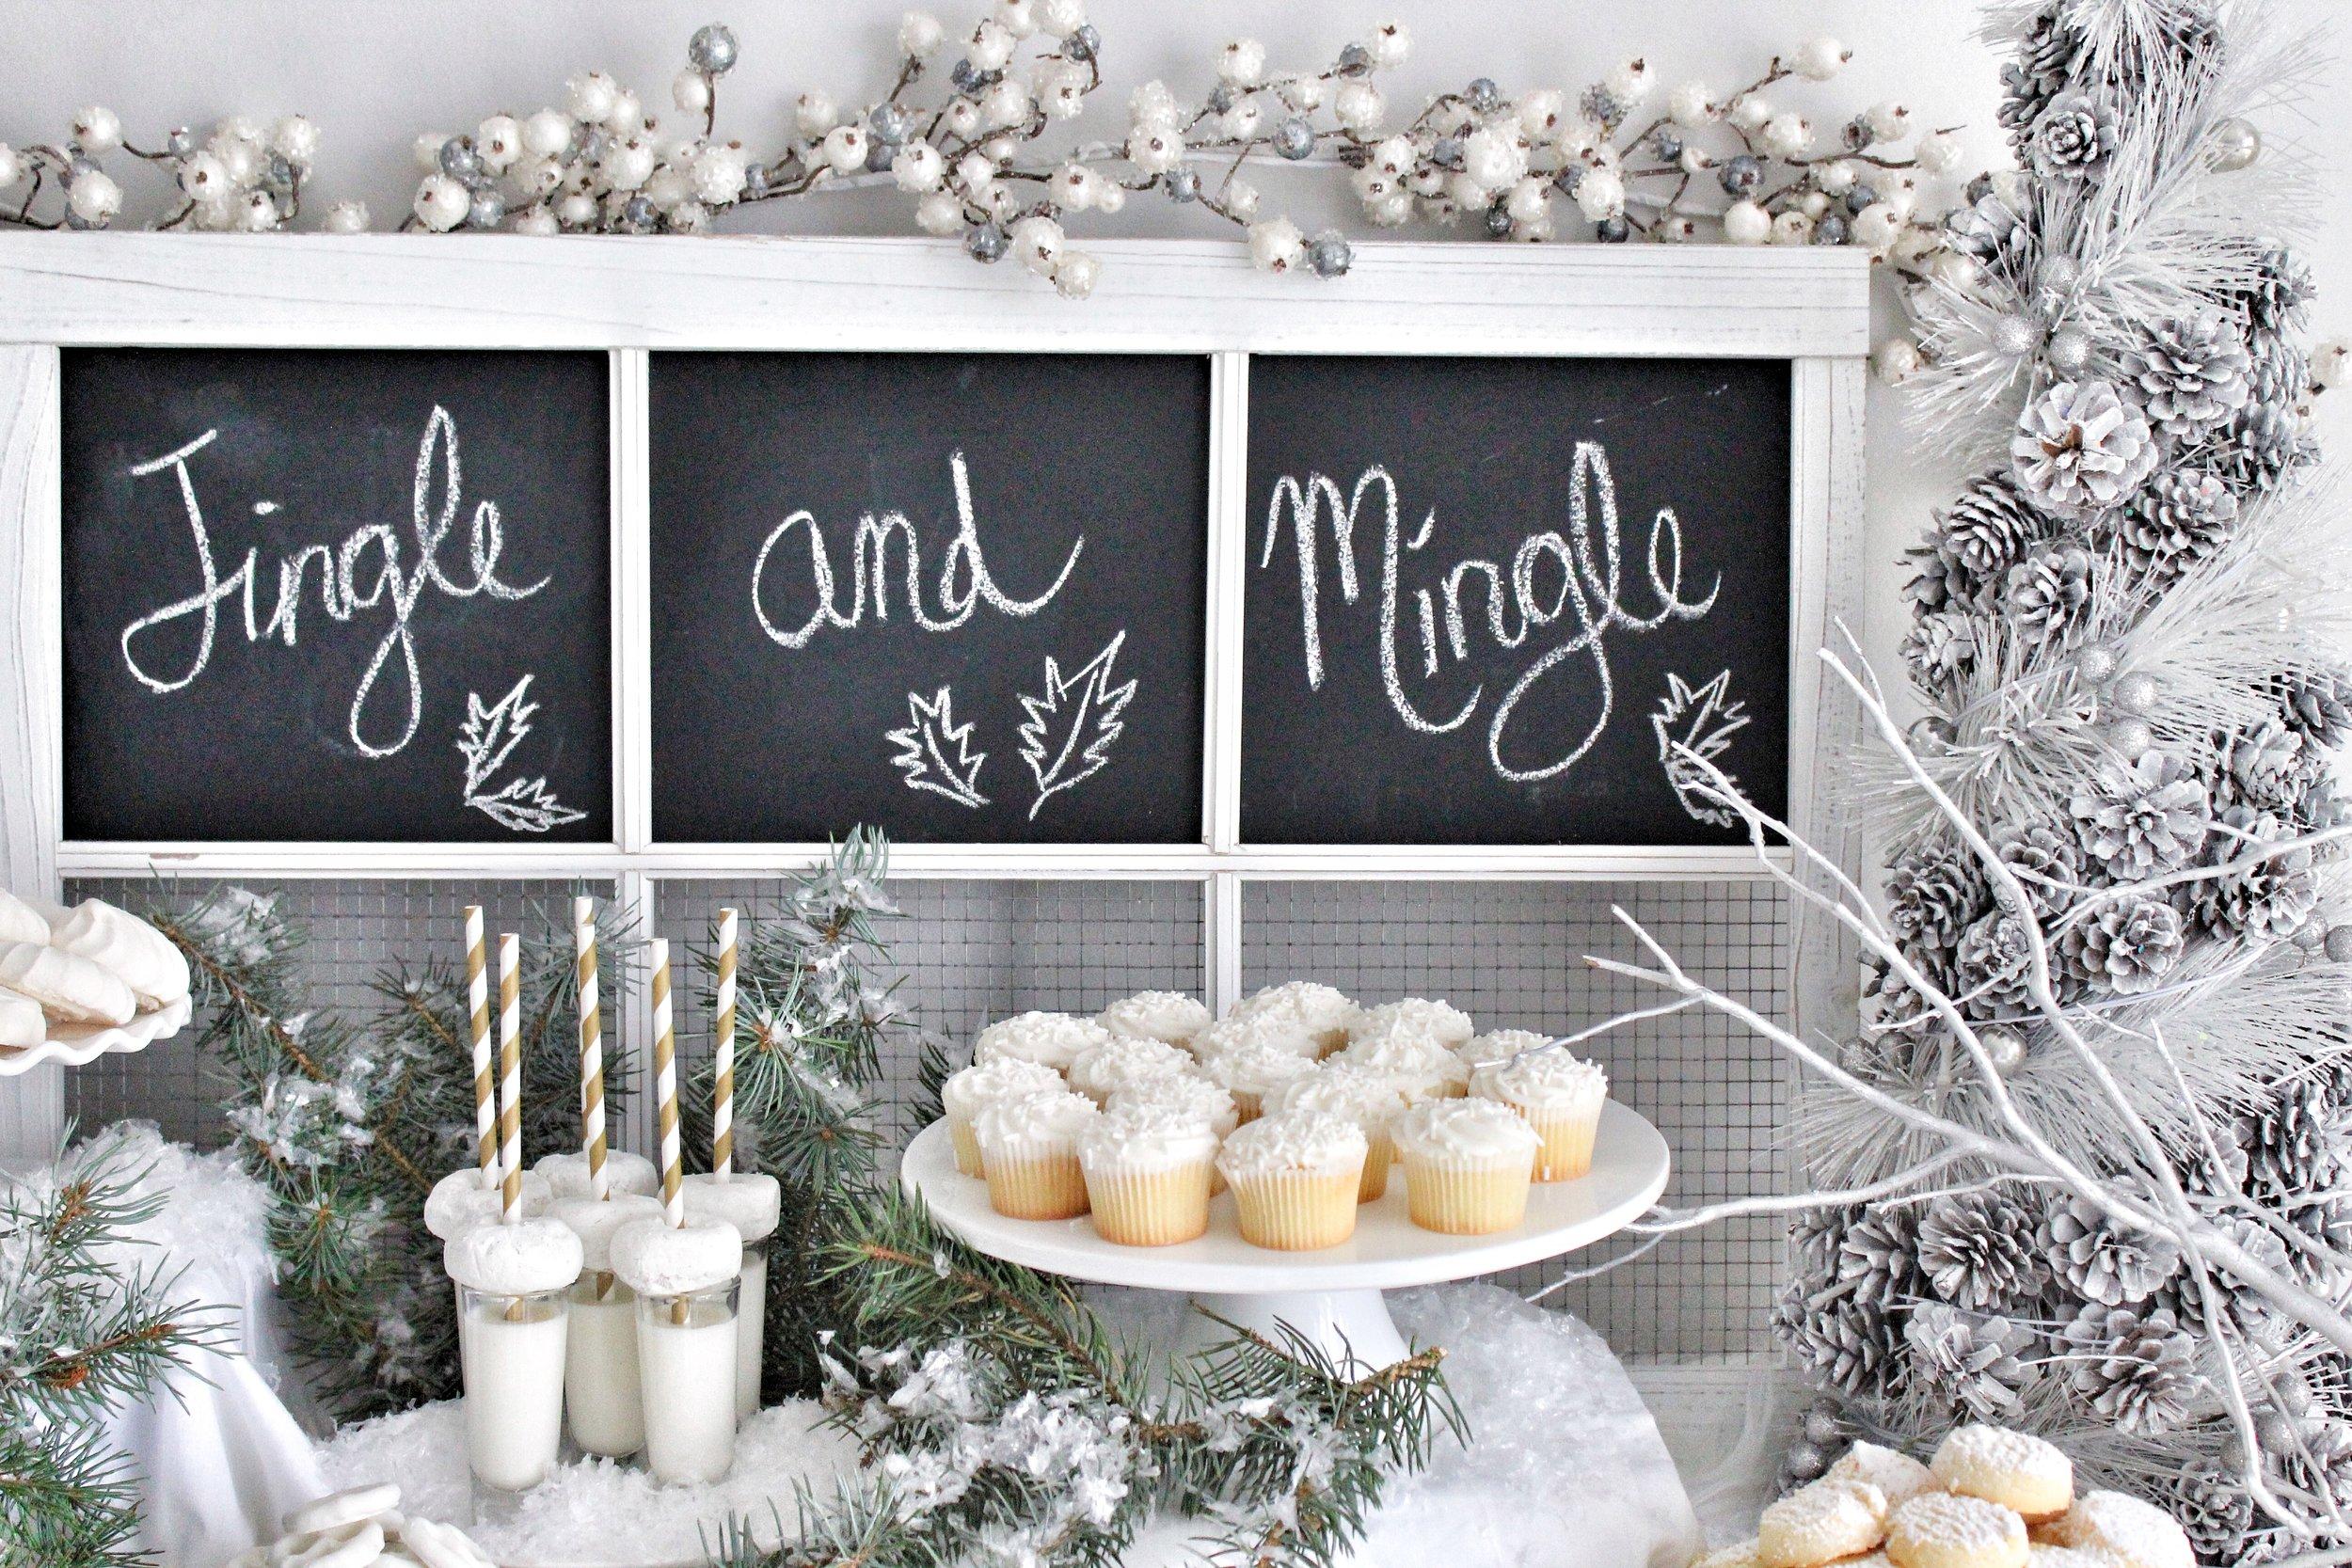 jingle-mingle-dessert-bar-2-1217.jpg